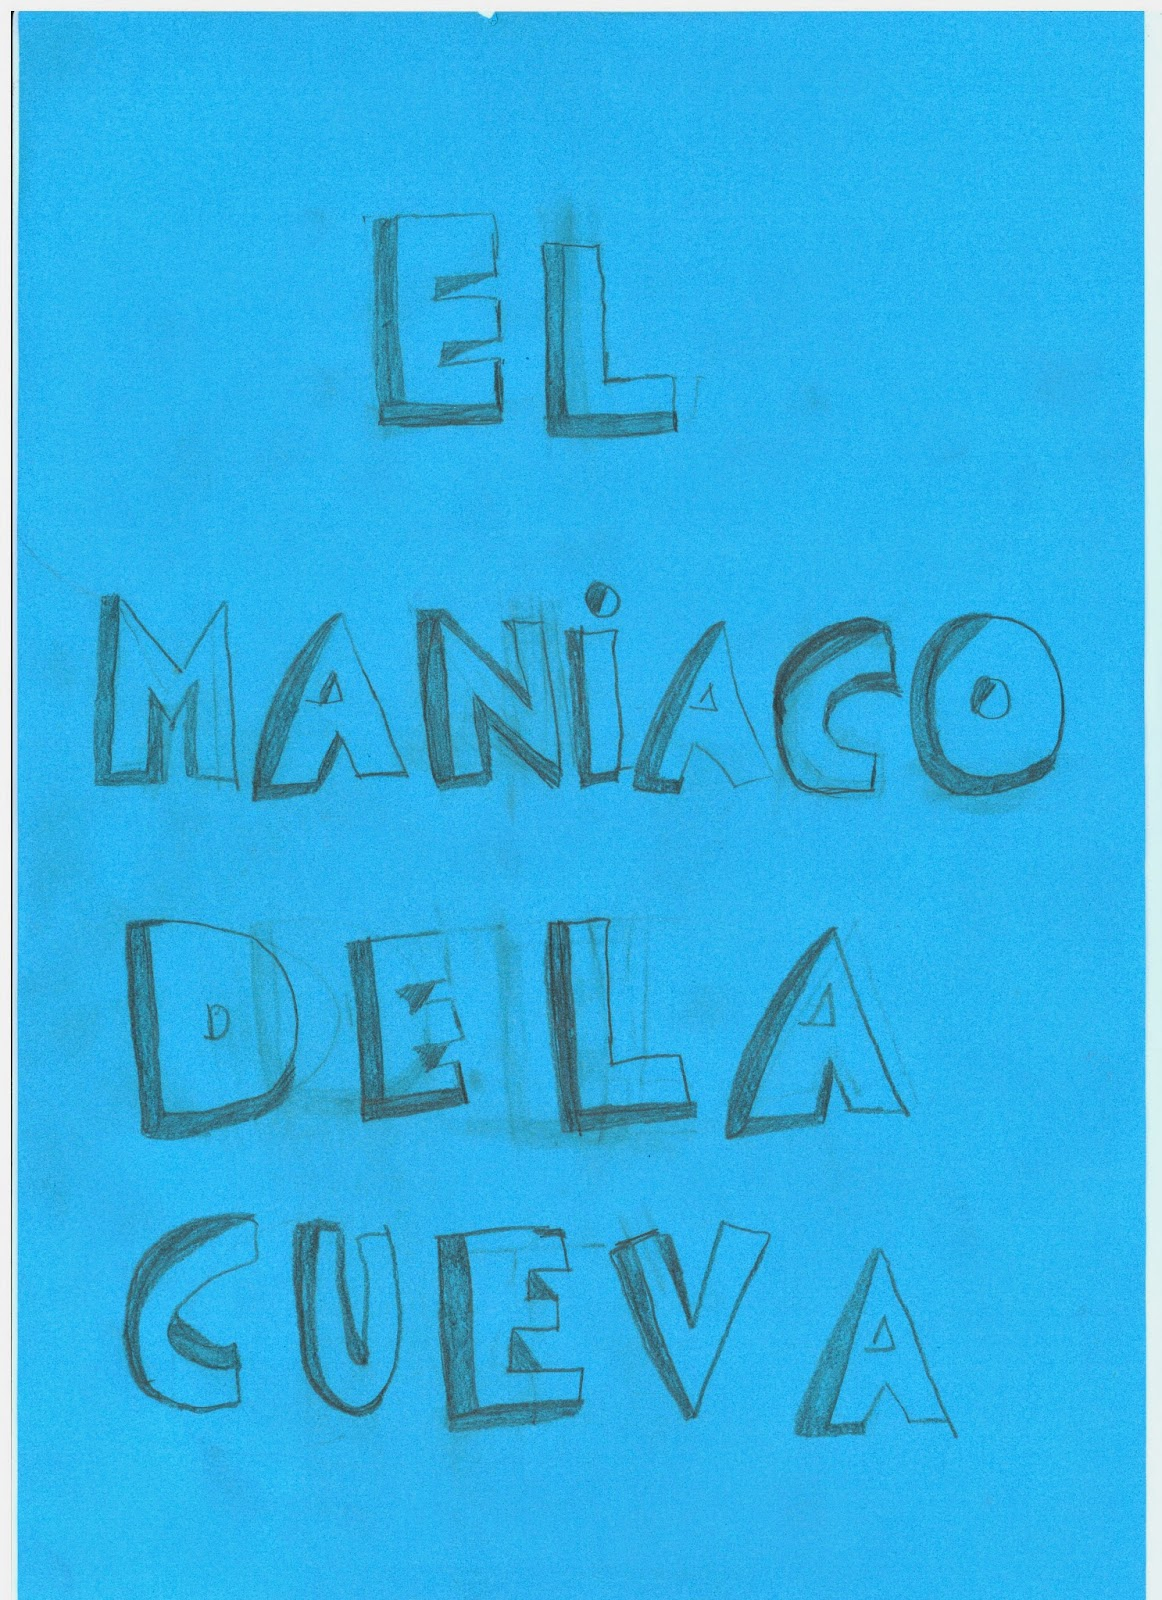 http://issuu.com/anamariamorenovicente/docs/el_maniaco_de_la_cueva..pptx